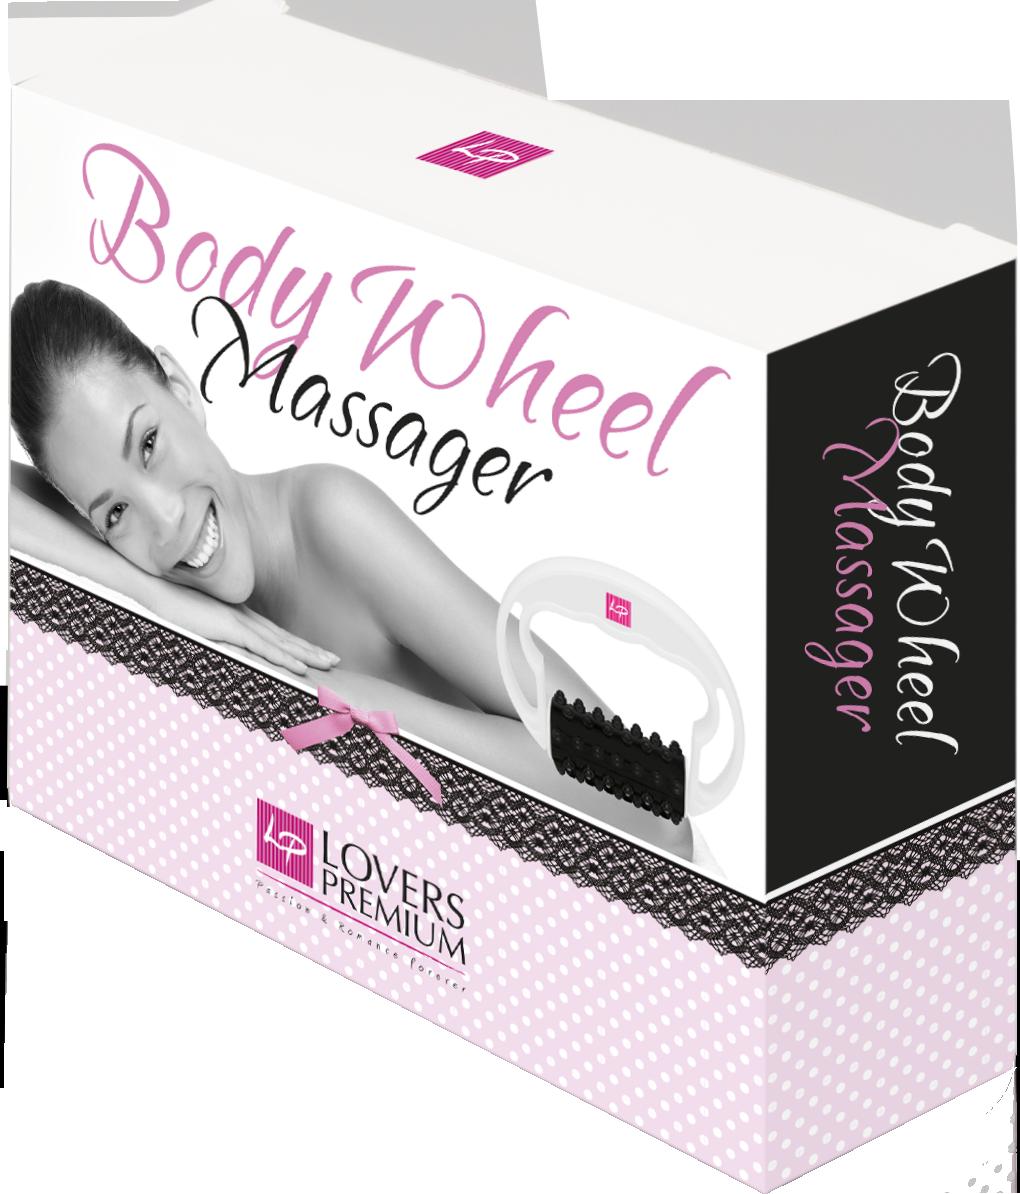 Body Wheel Massager - massagiatore corpo